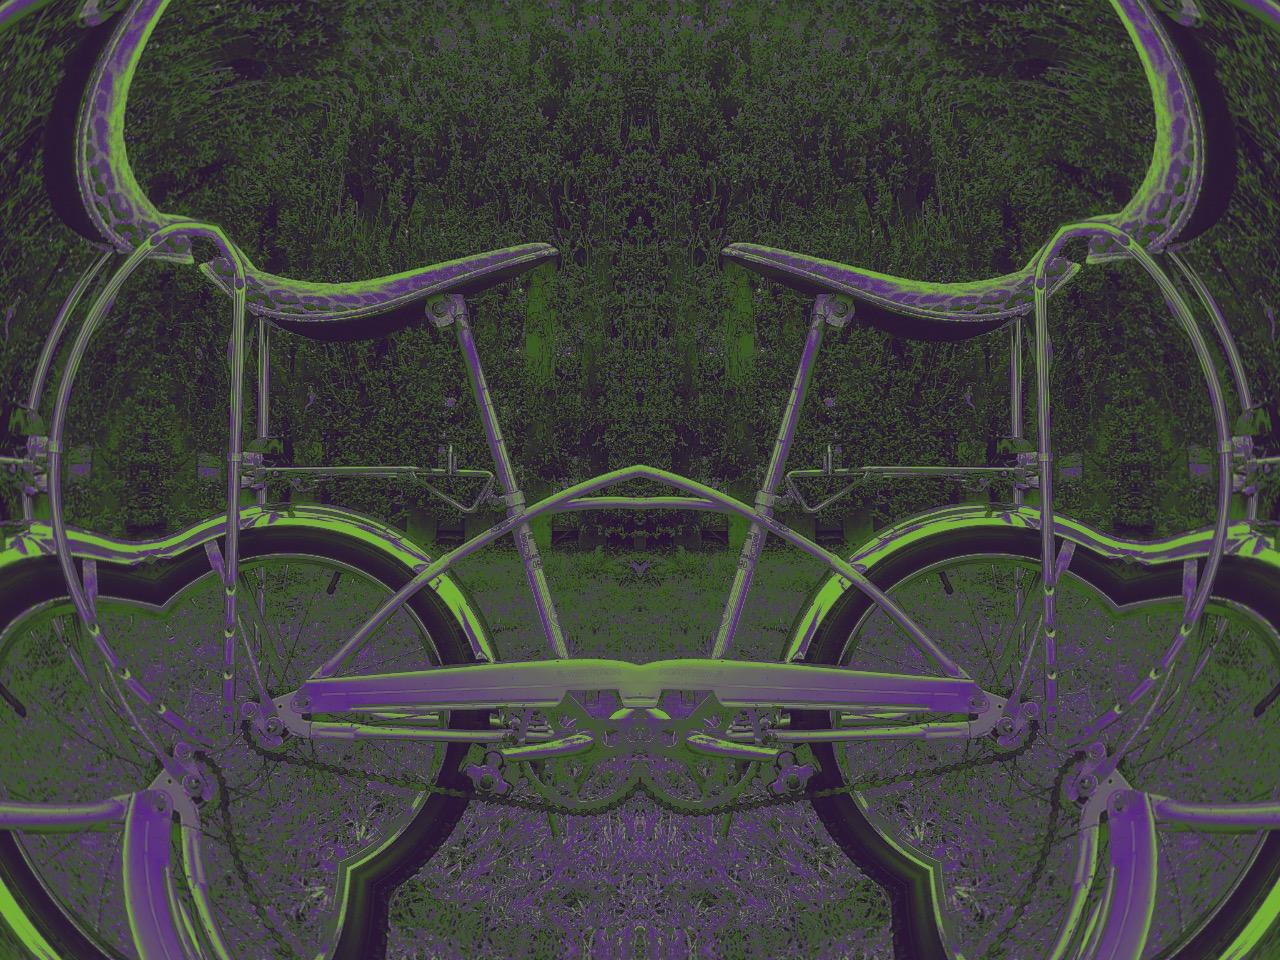 815CD155-4FE0-4289-978D-241CDBC76BF3.jpeg